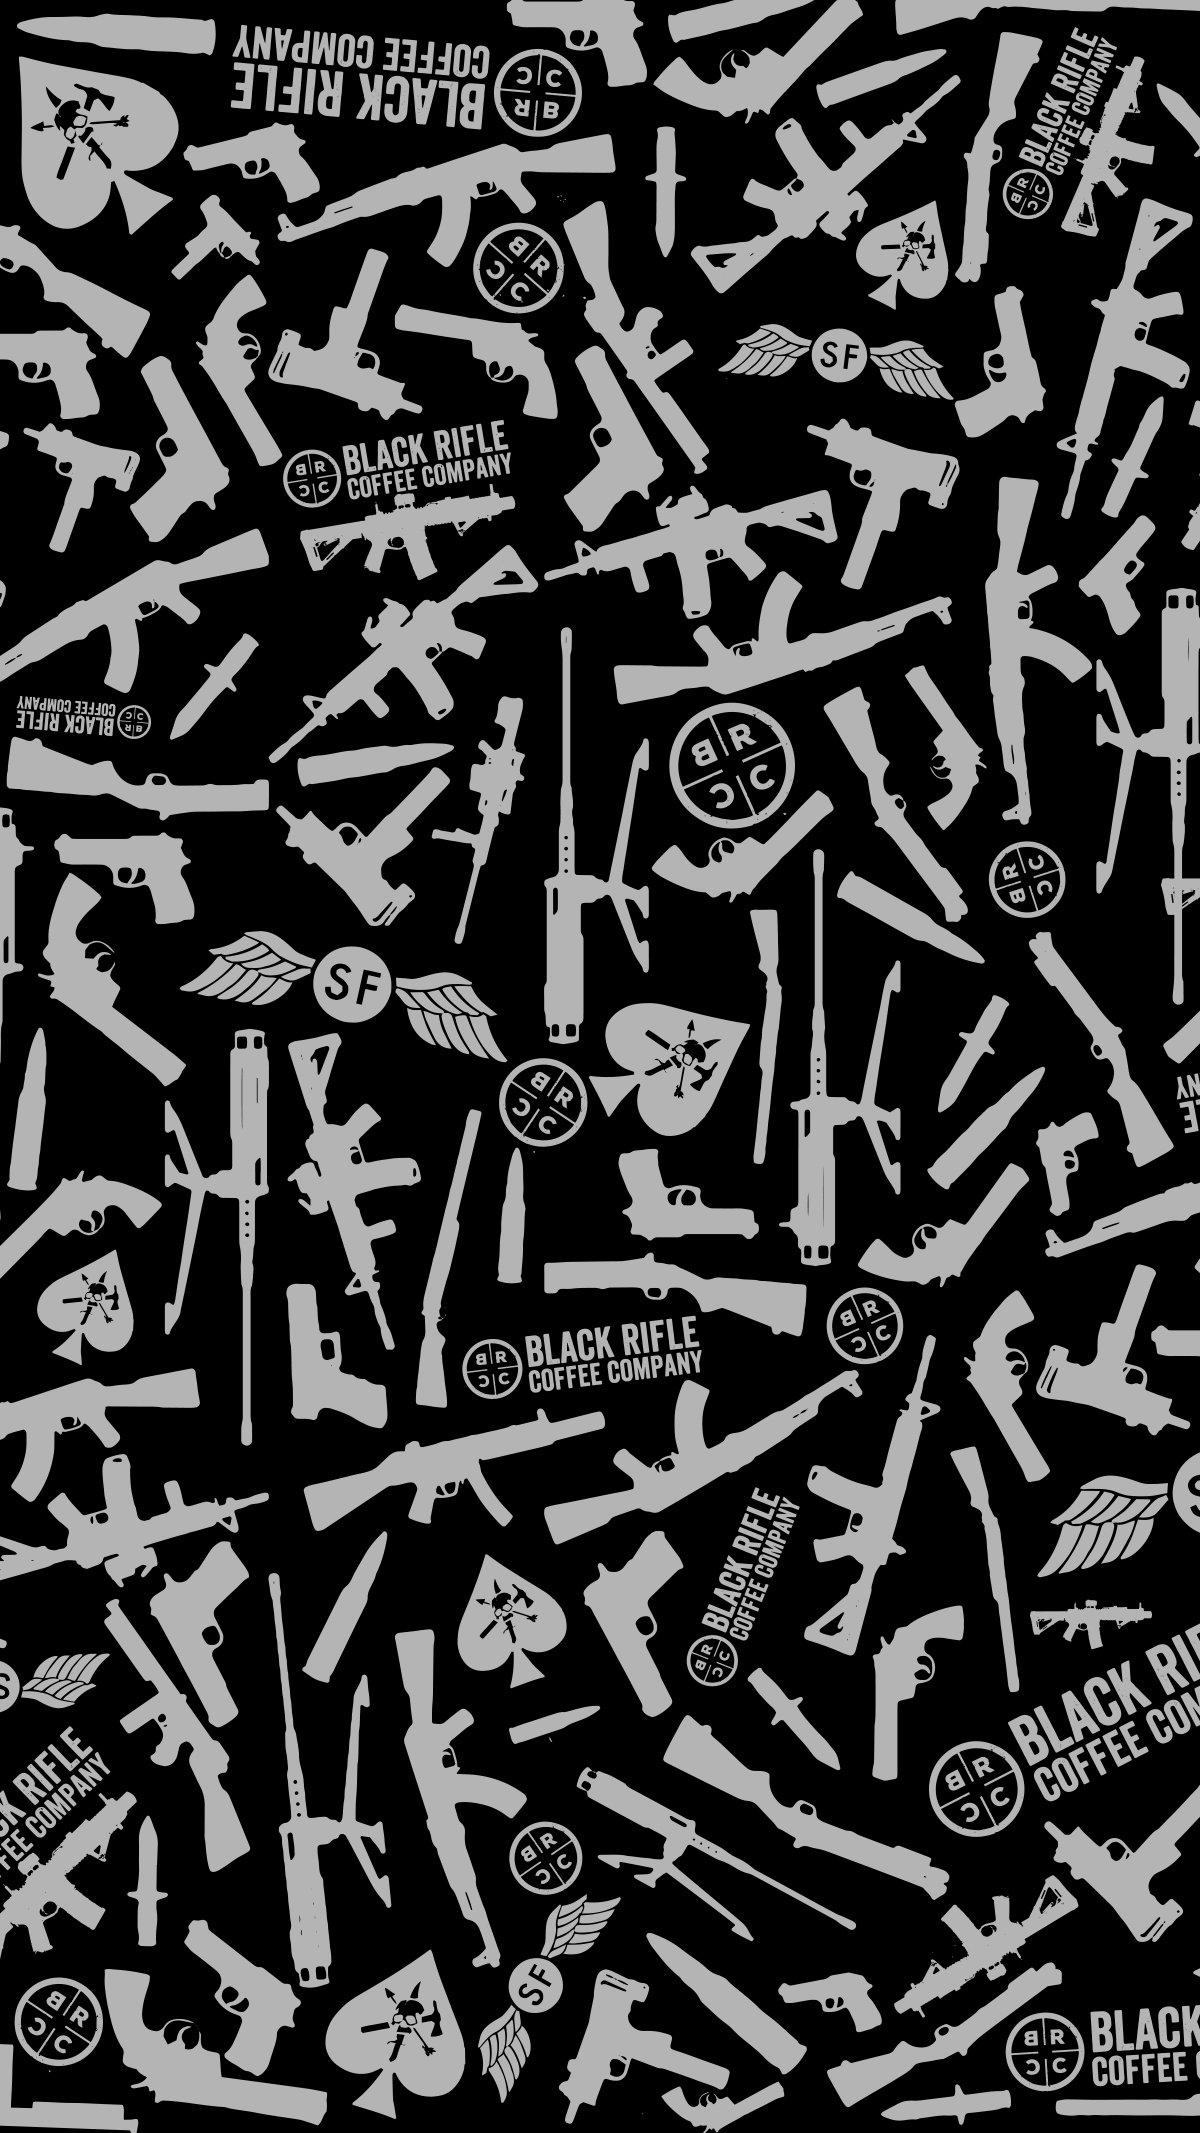 Phone Wallpapers Black Rifle Coffee Company 1200x2133